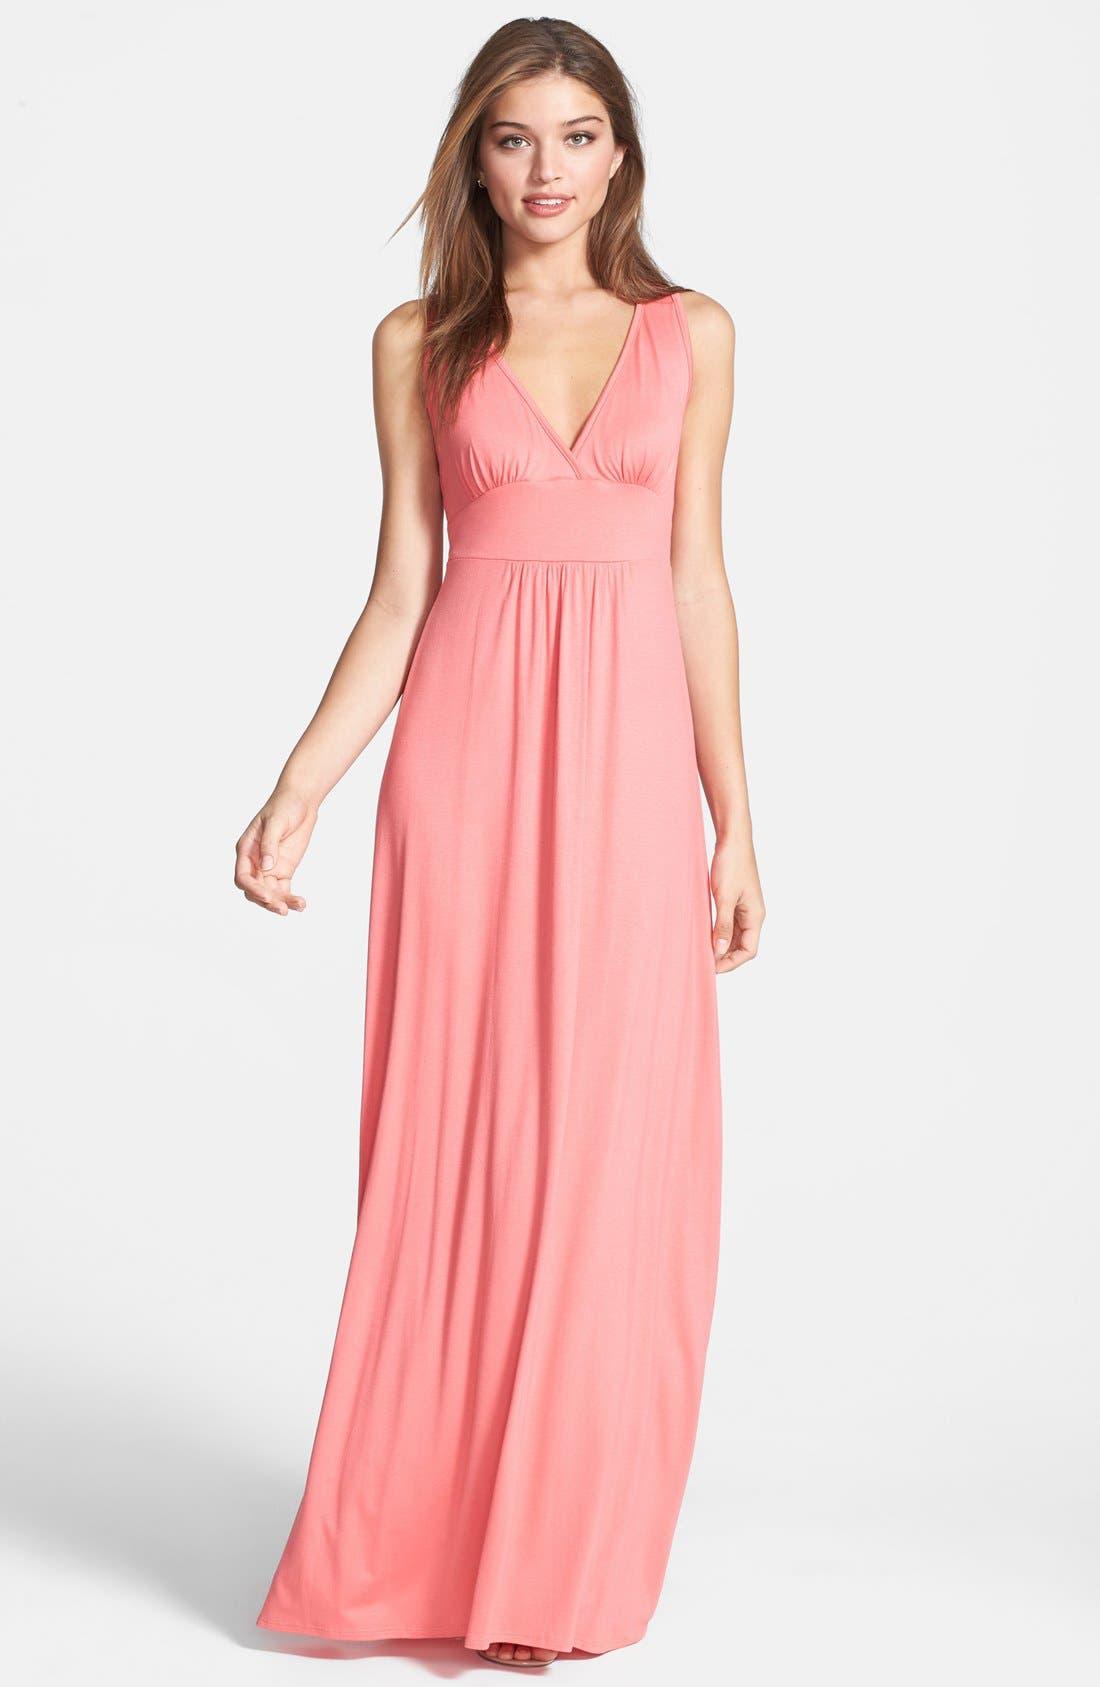 Alternate Image 1 Selected - Loveappella V-Neck Stretch Knit Maxi Dress